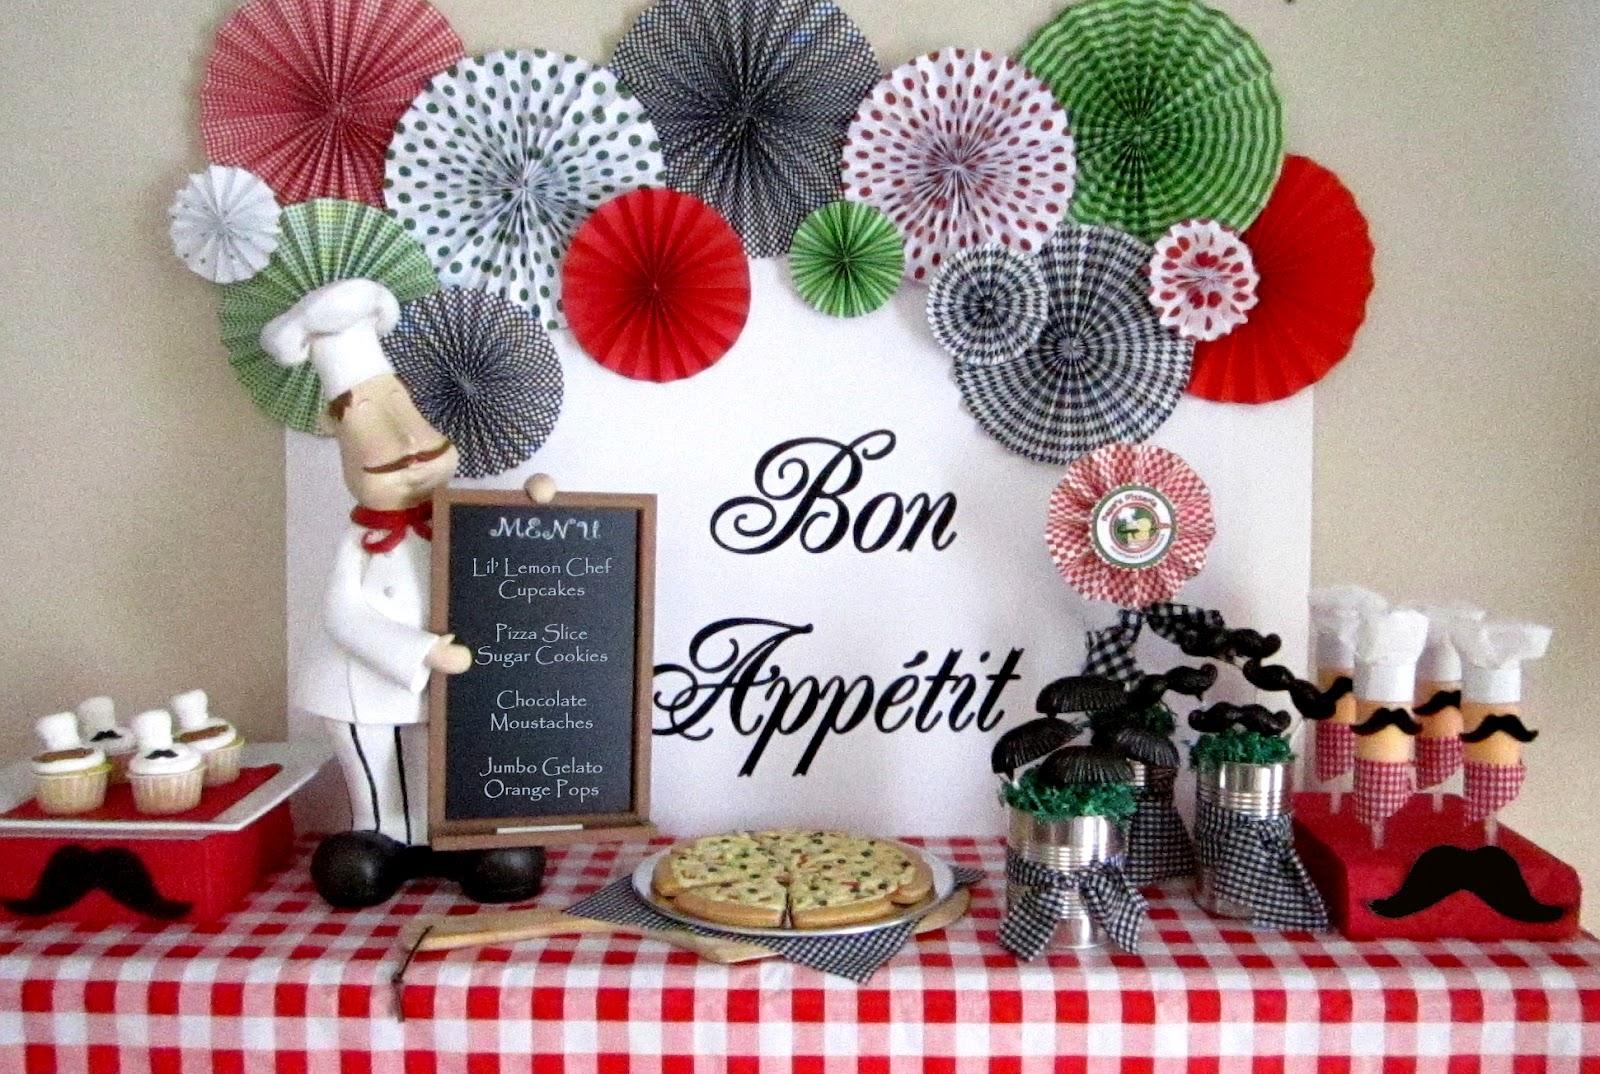 We Had Some Sweet Treats On A Mini Dessert Table